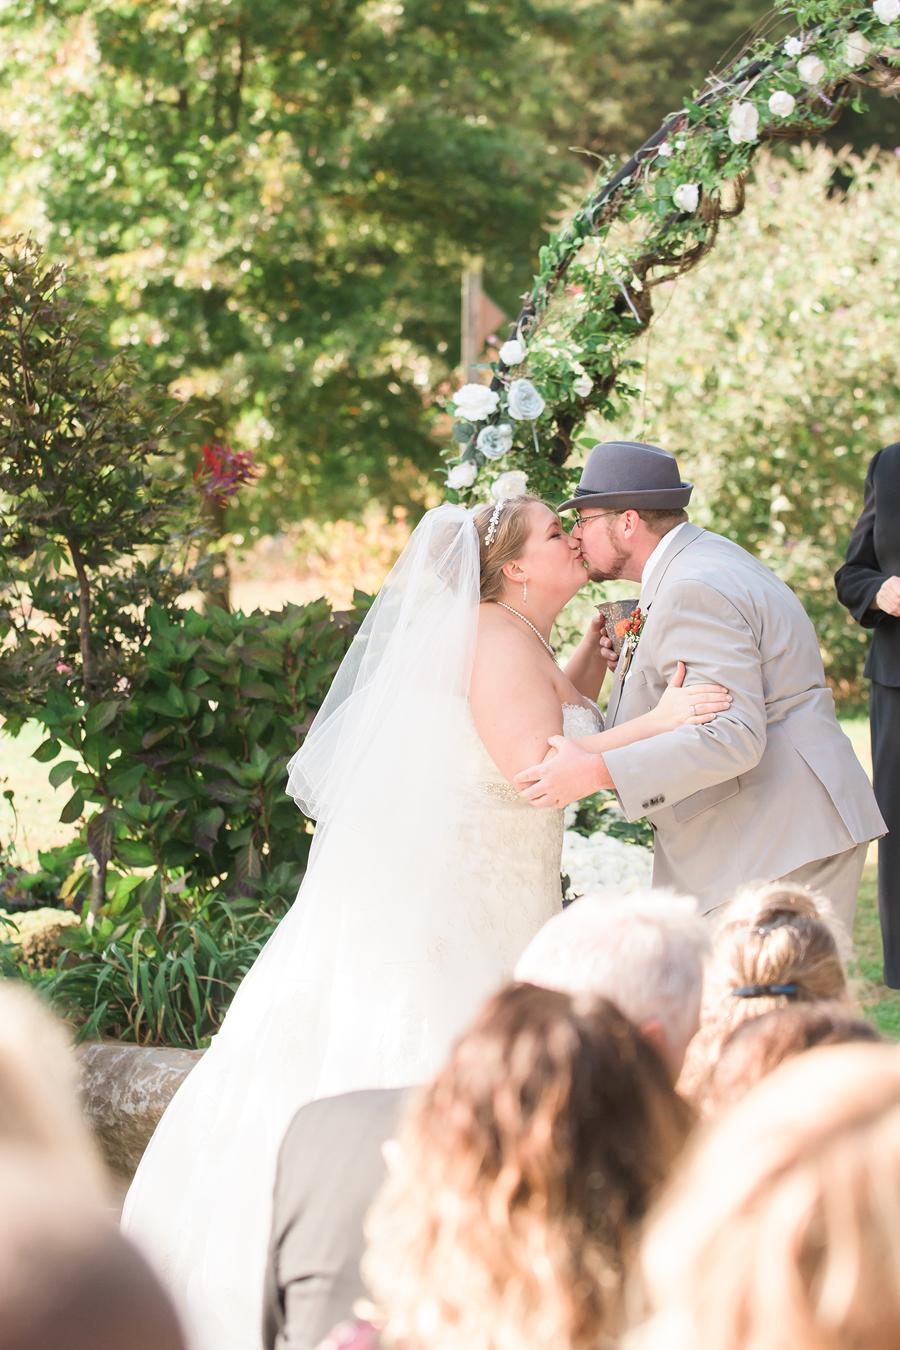 079-0460-kmb_wedding-1308